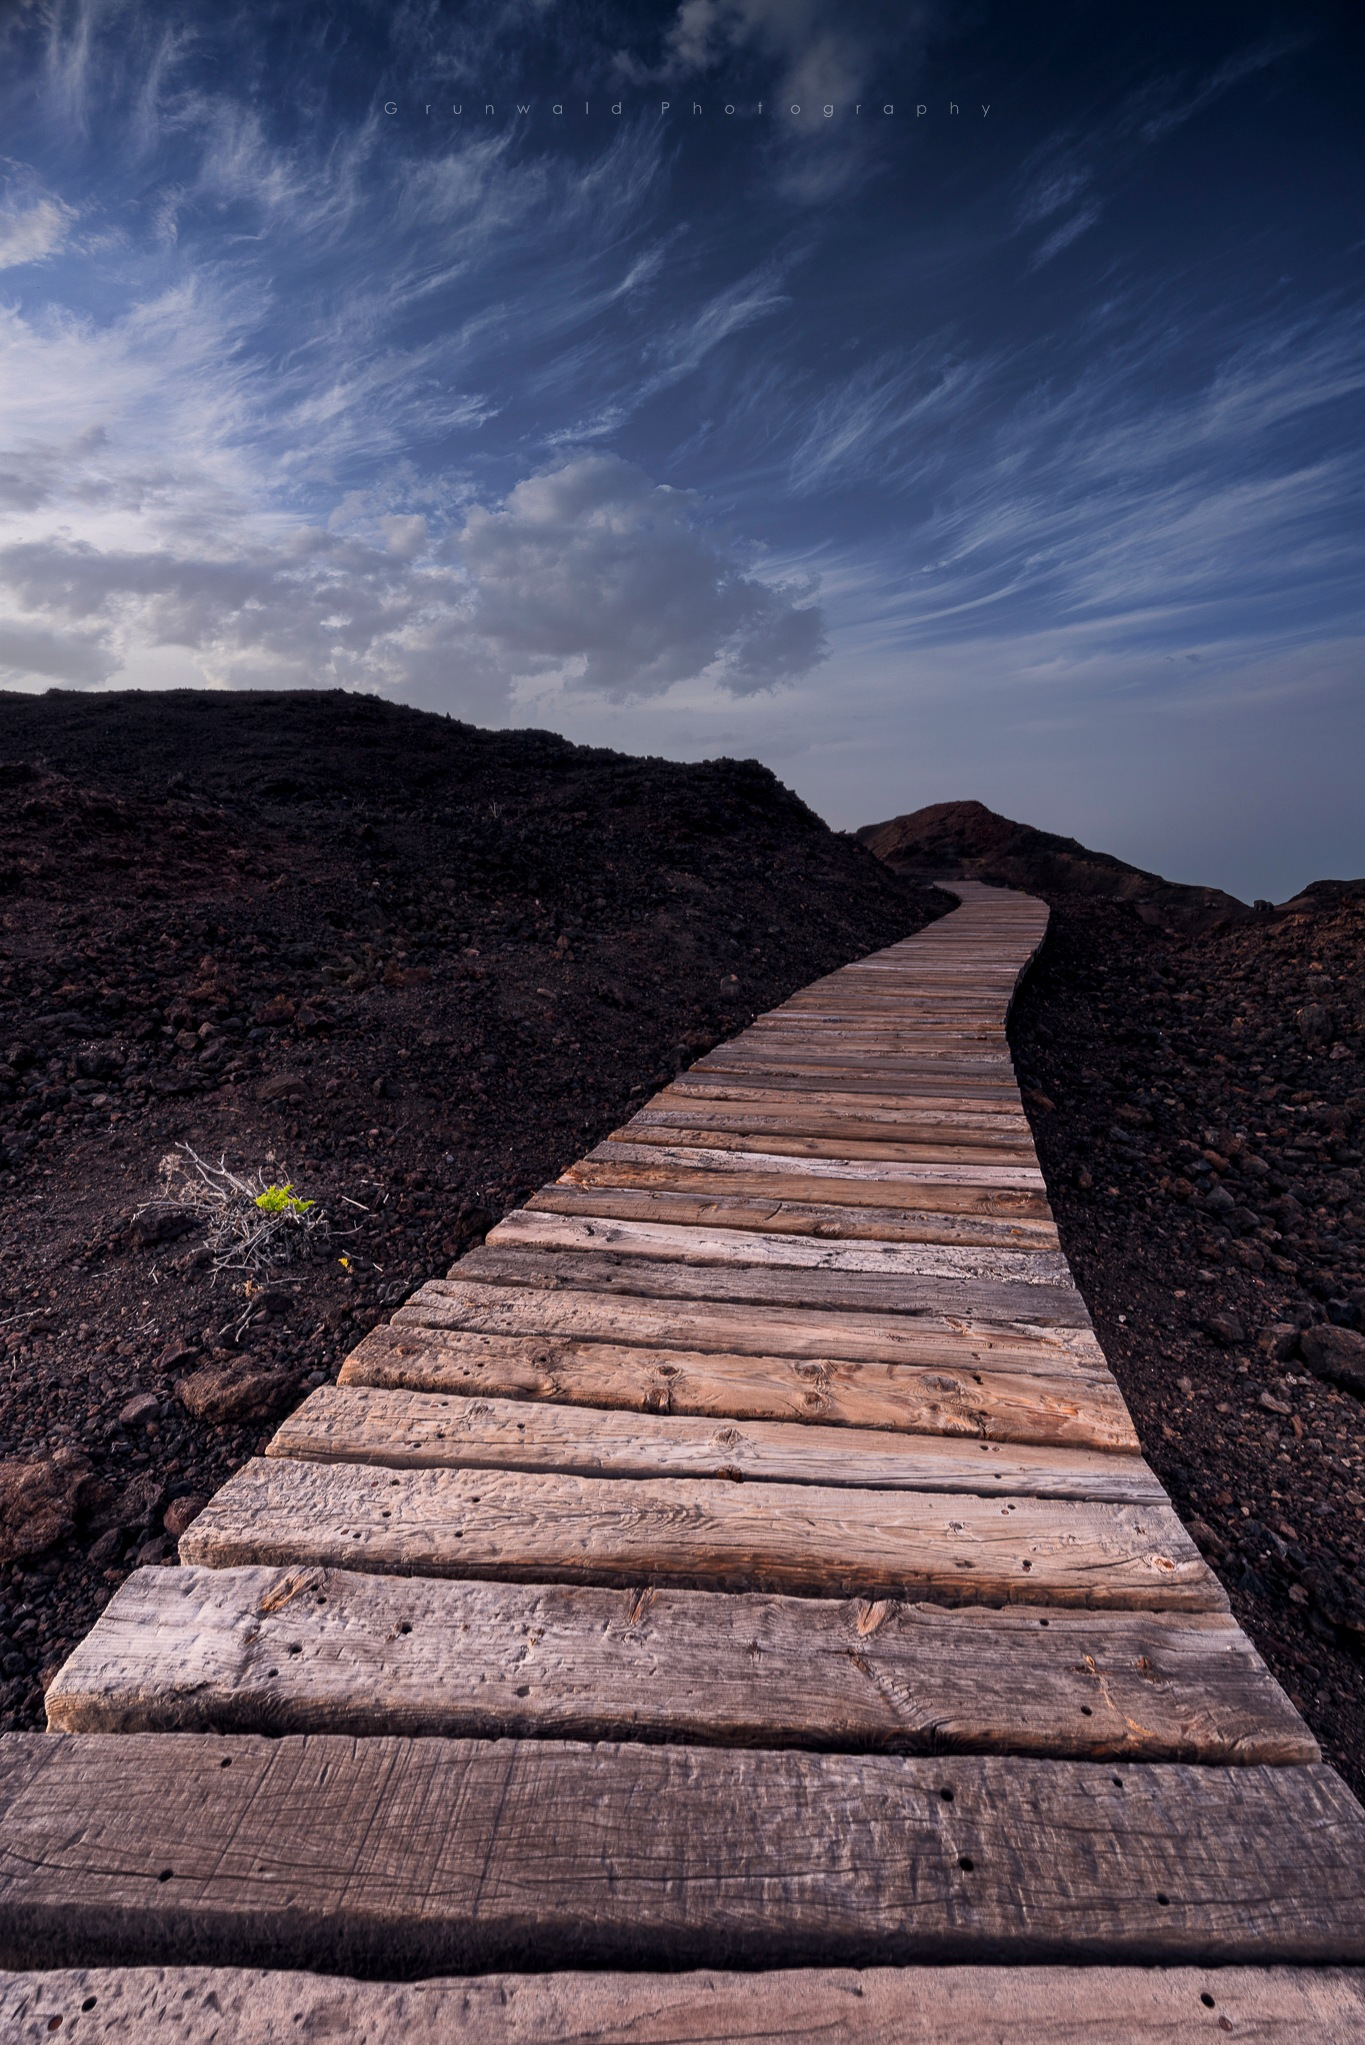 Steps to nowhere by PawelGrunwald